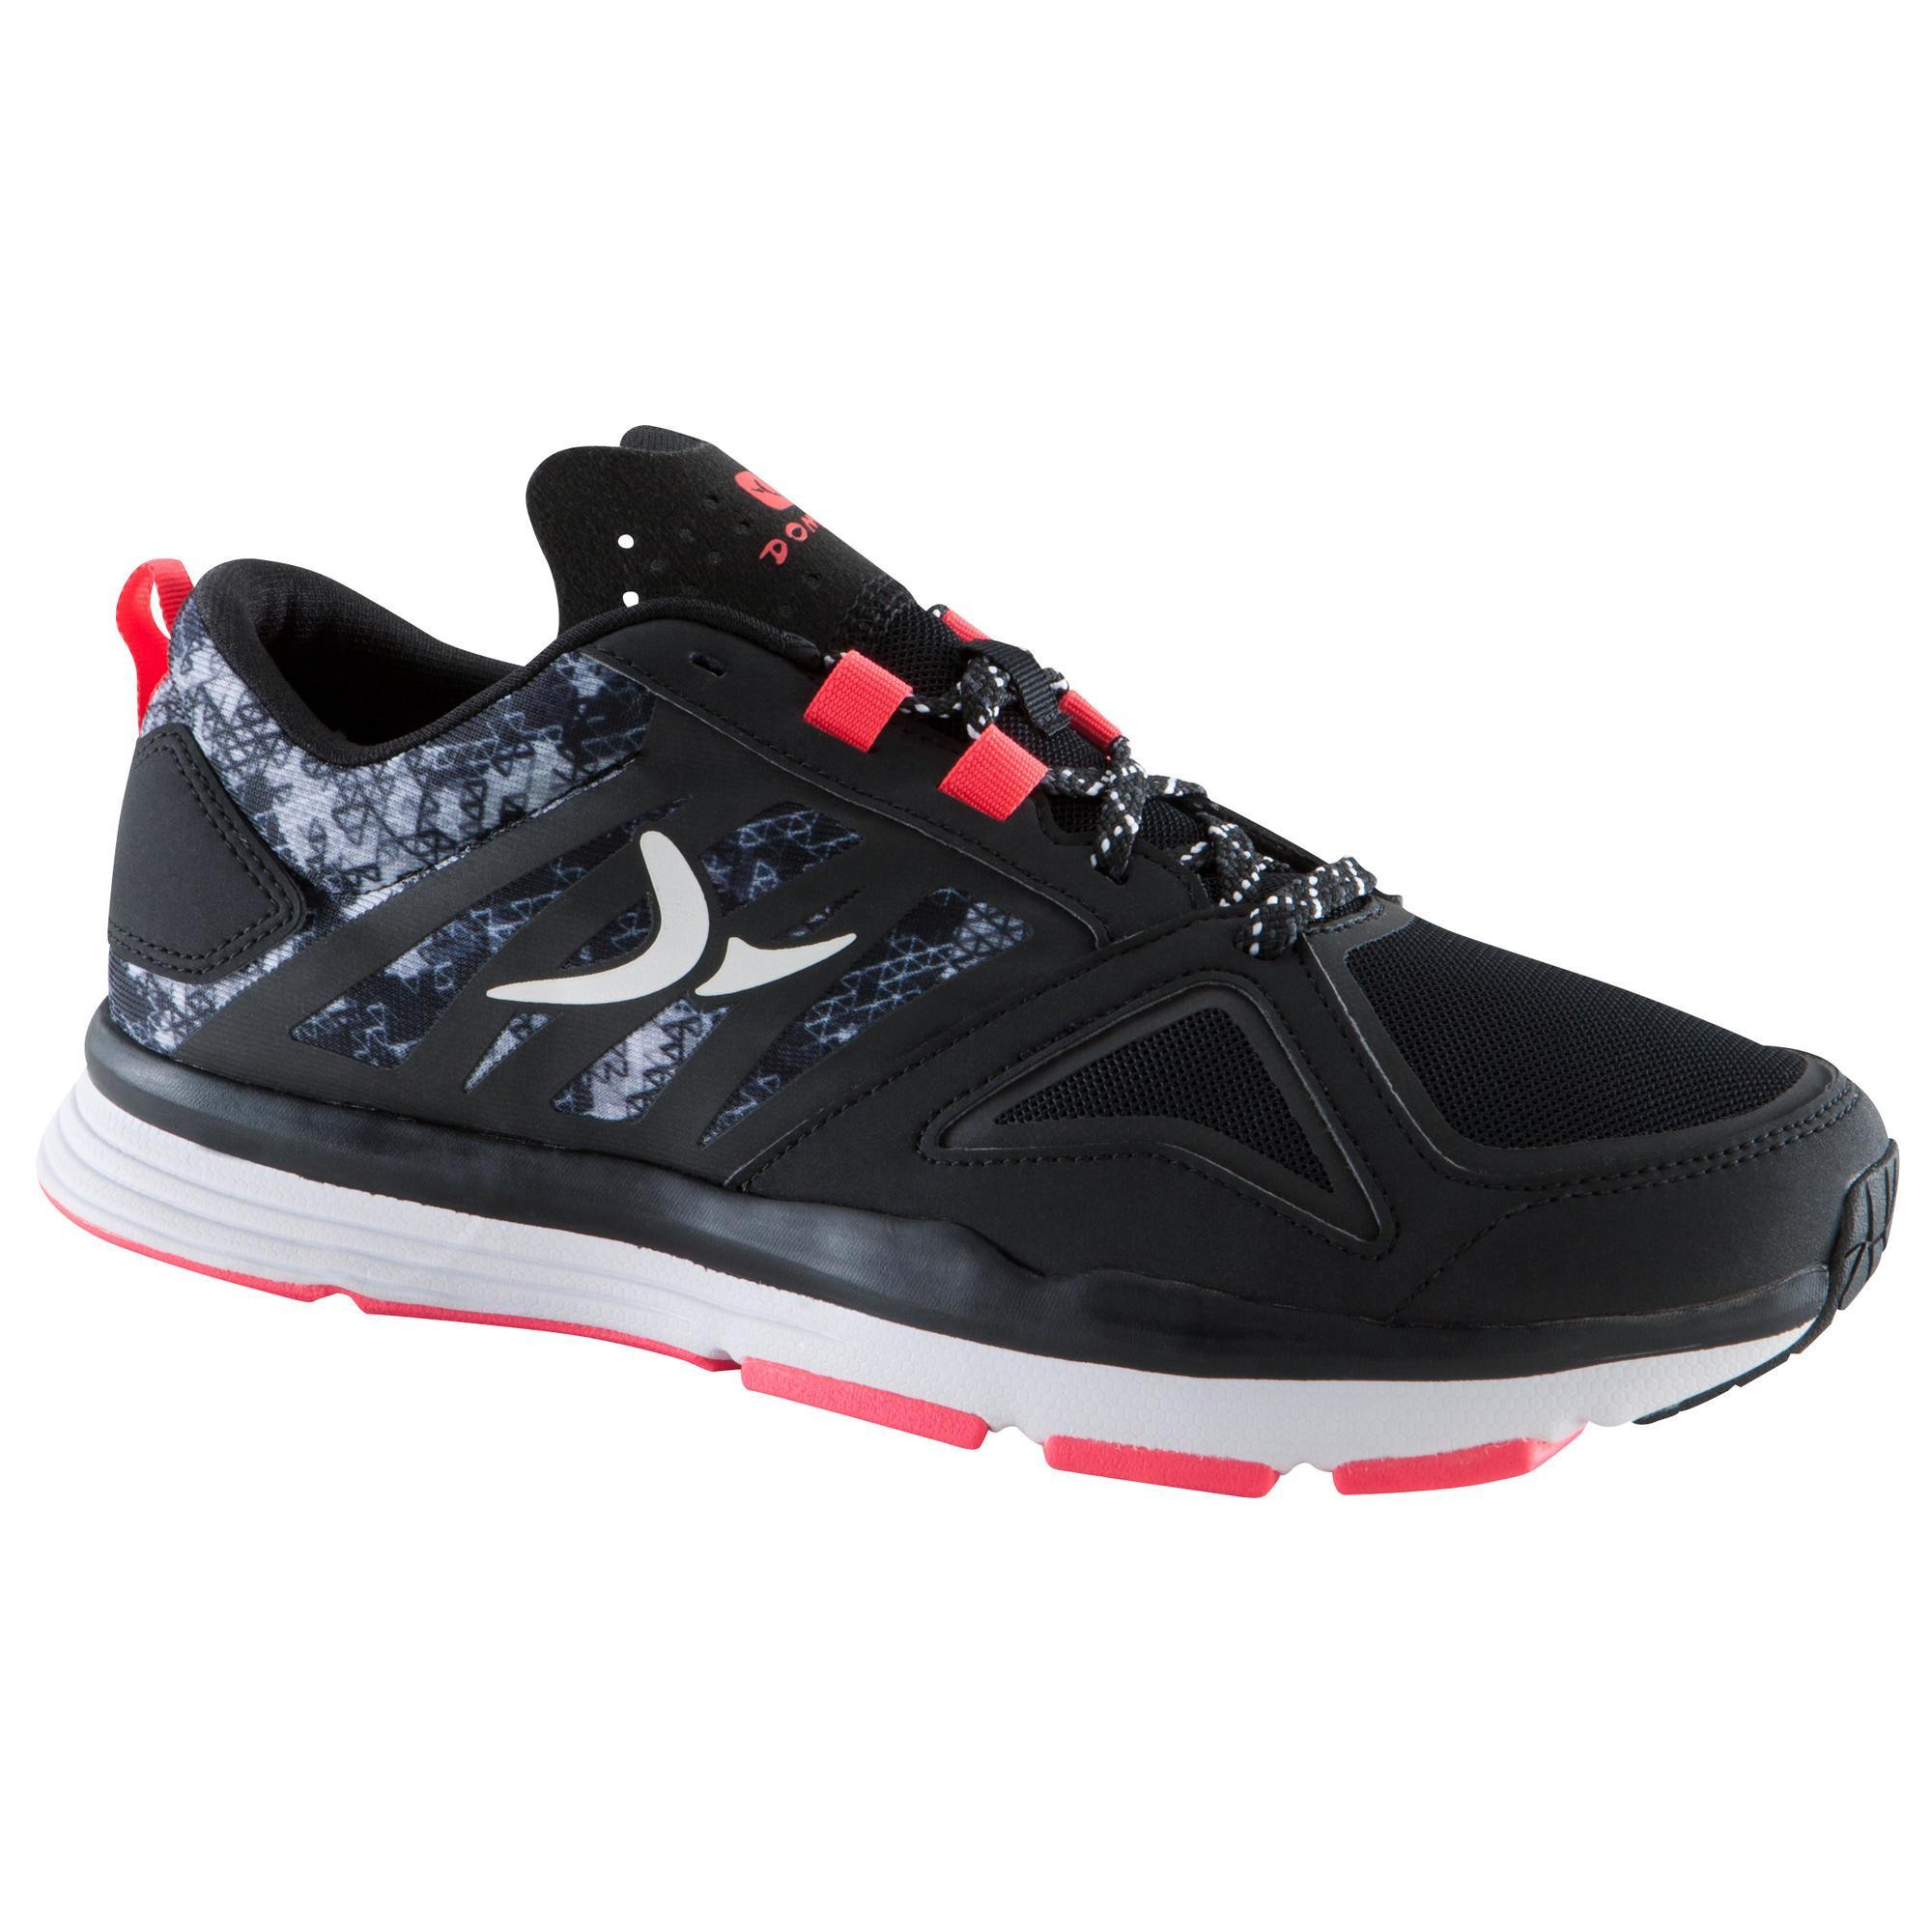 Chaussure fitness cardio femme noir rose energy 900 - Tapis de course energetics power run 4 0 ...